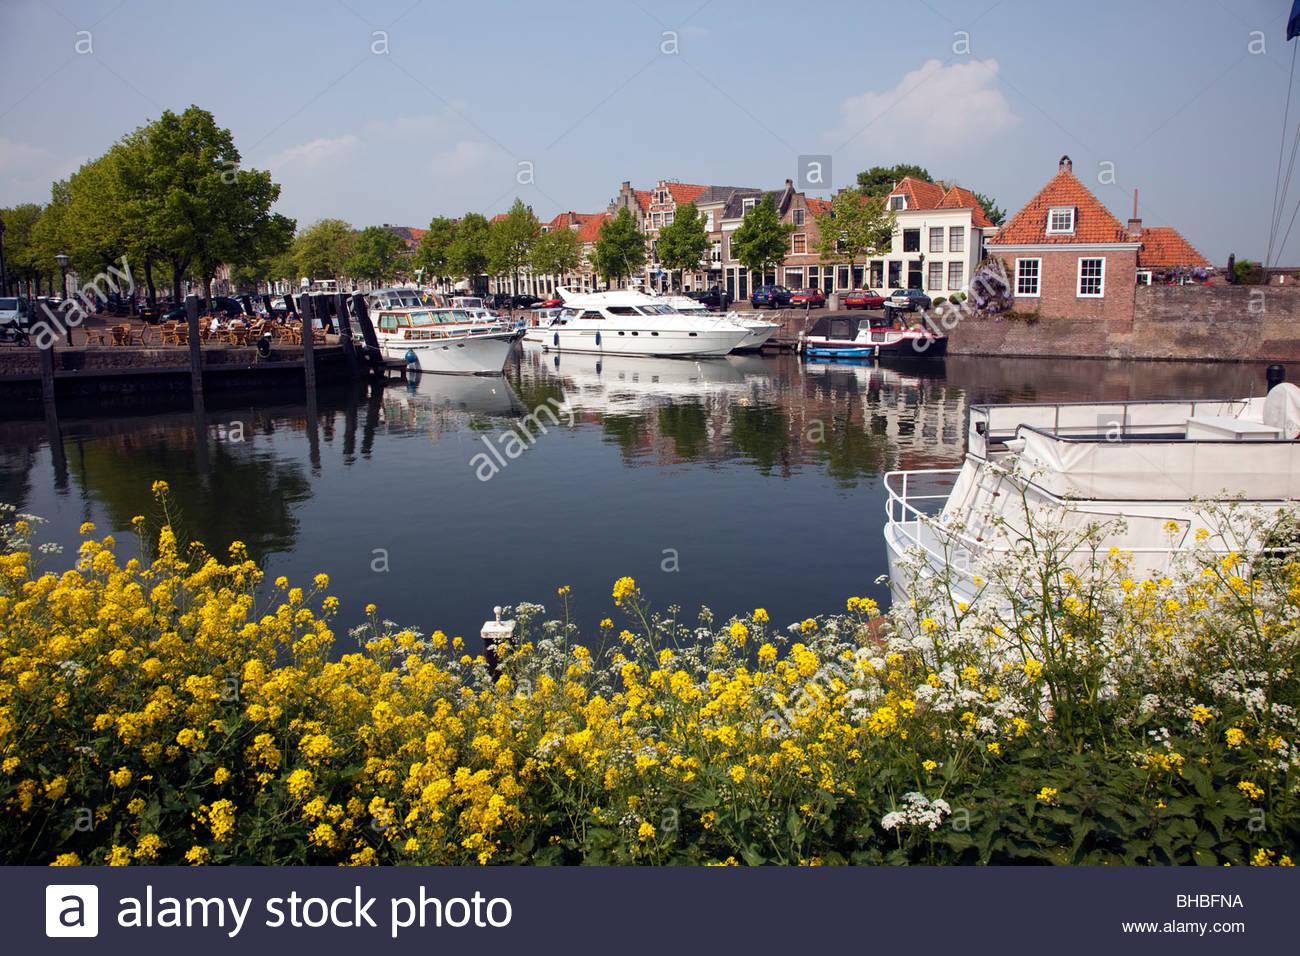 Benelux Bloemen Boat Boats Bomen